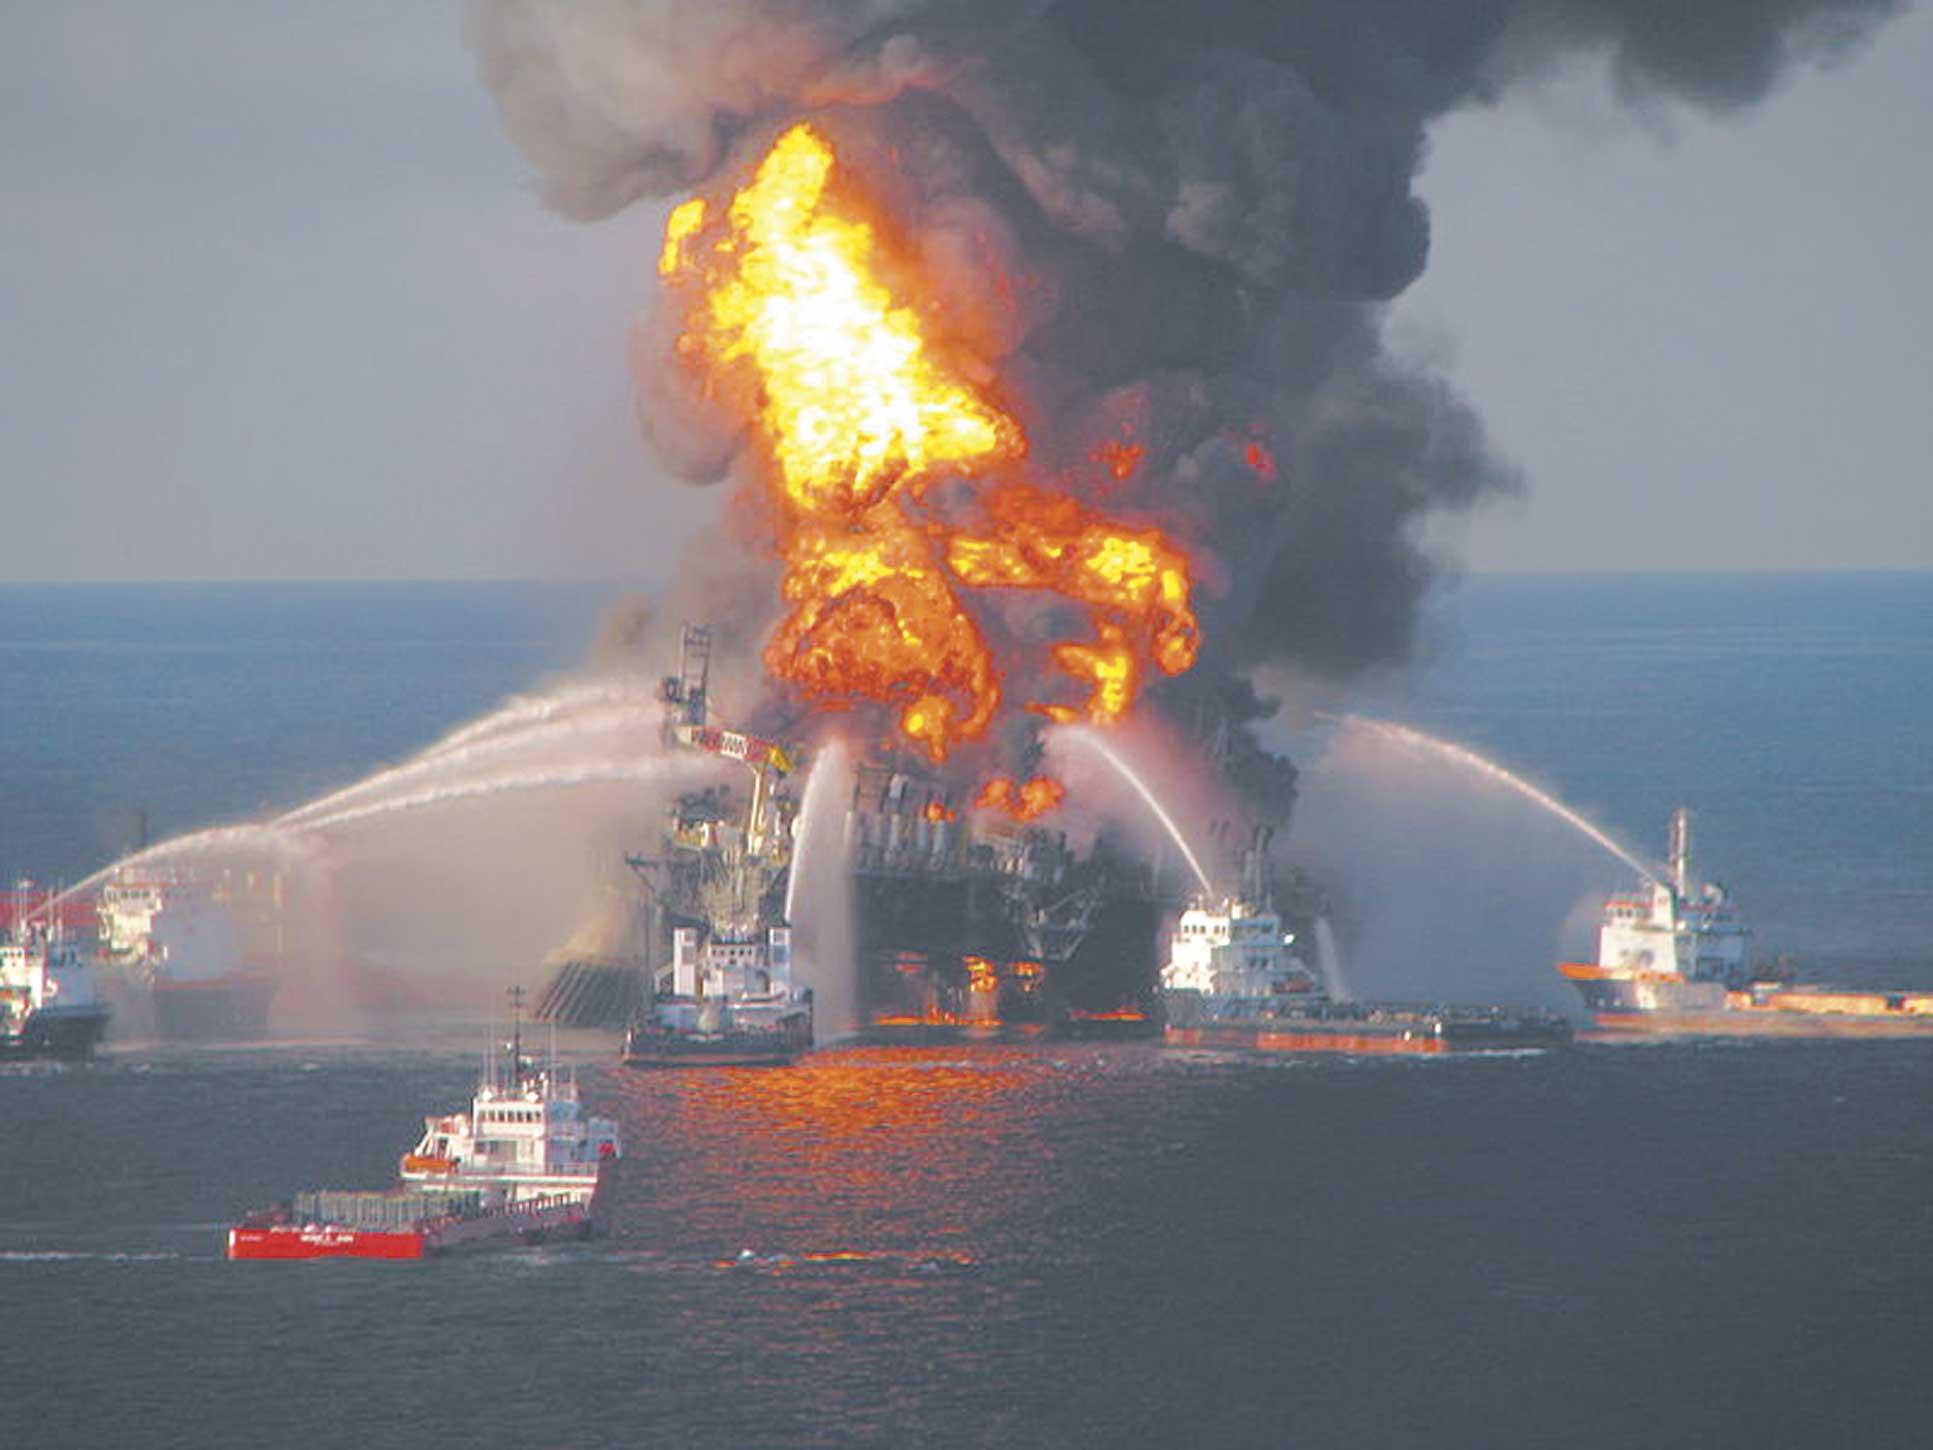 PR criis - BP oil spill